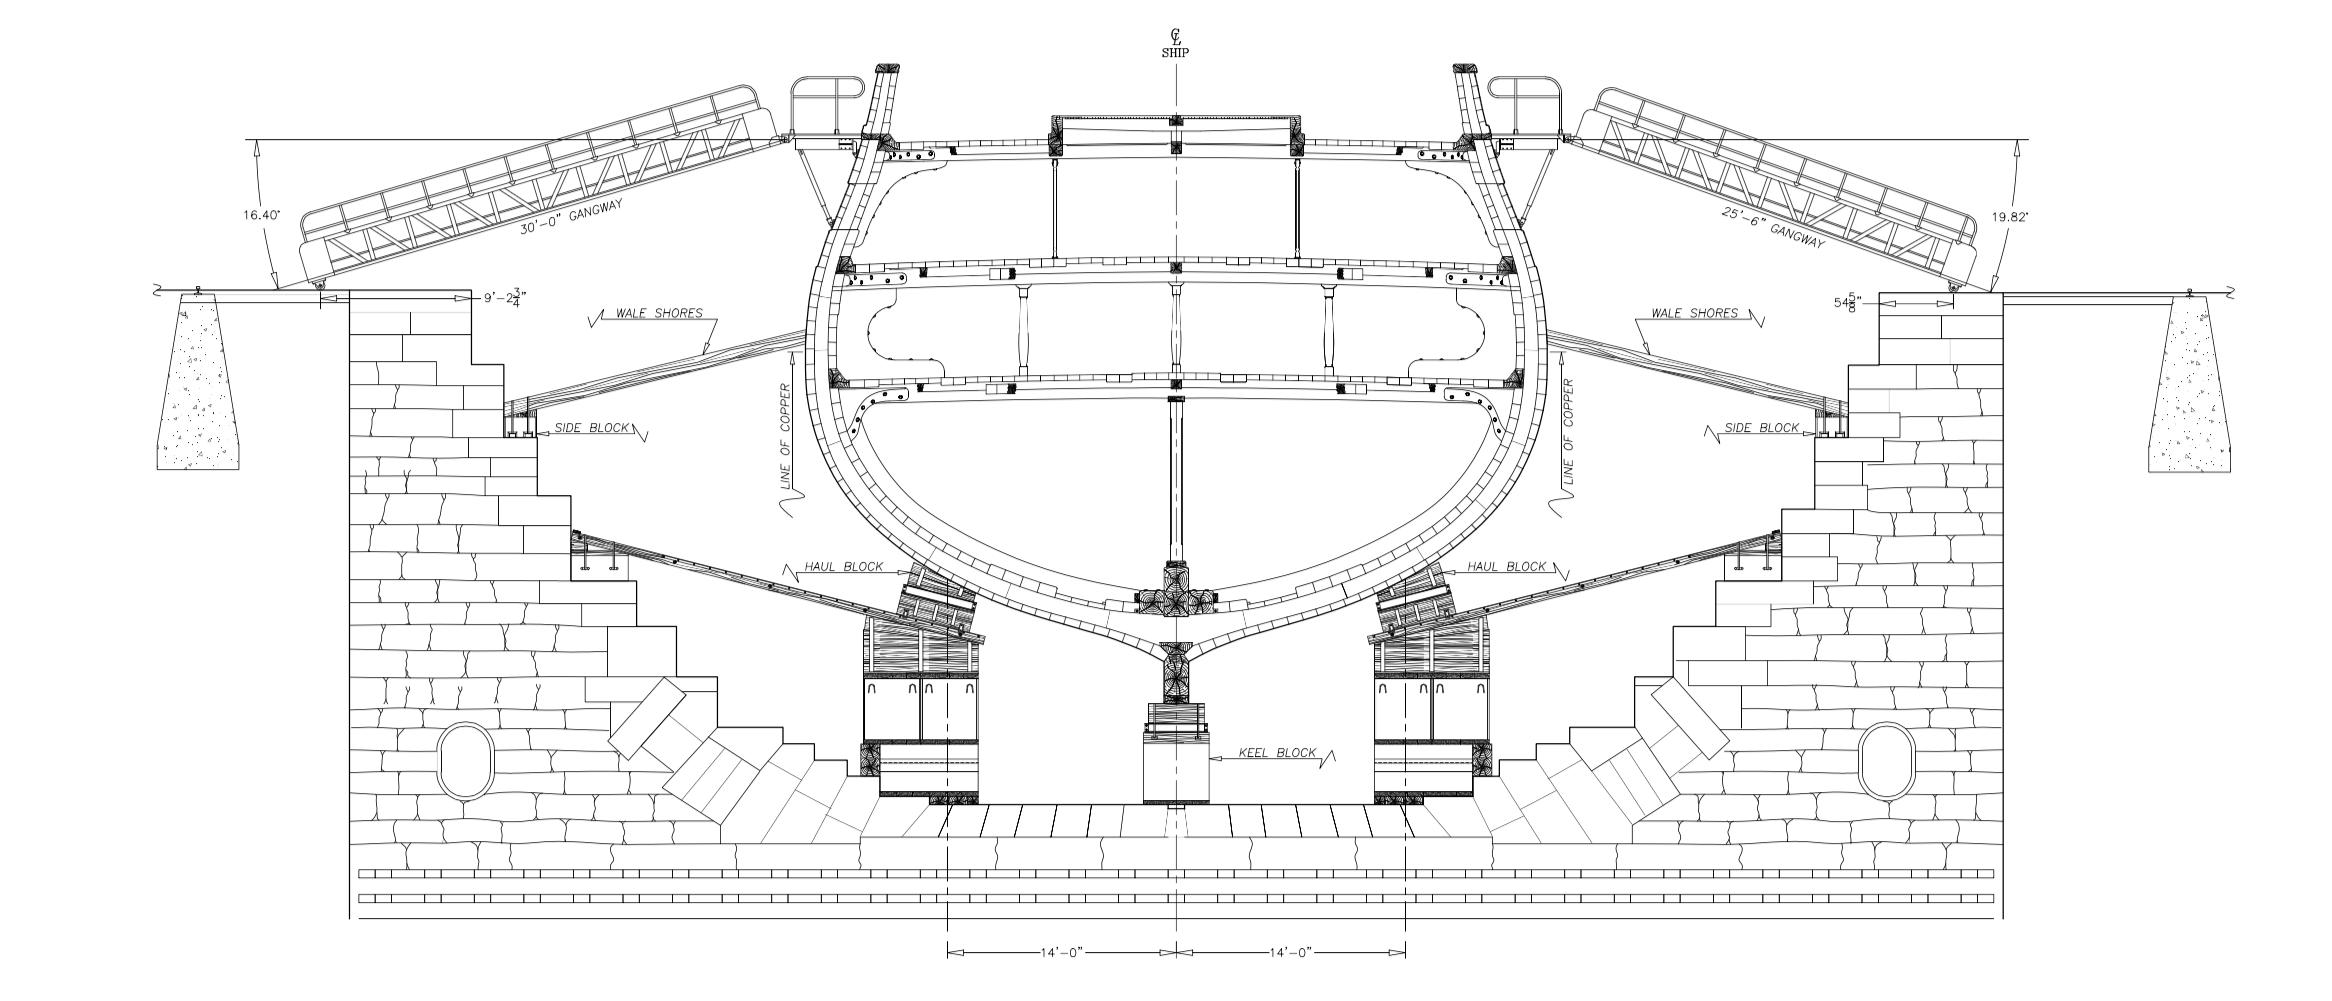 medium resolution of dry dock diagram wiring diagram blog dry well diagram charlestown navy yard dock lines dry dock